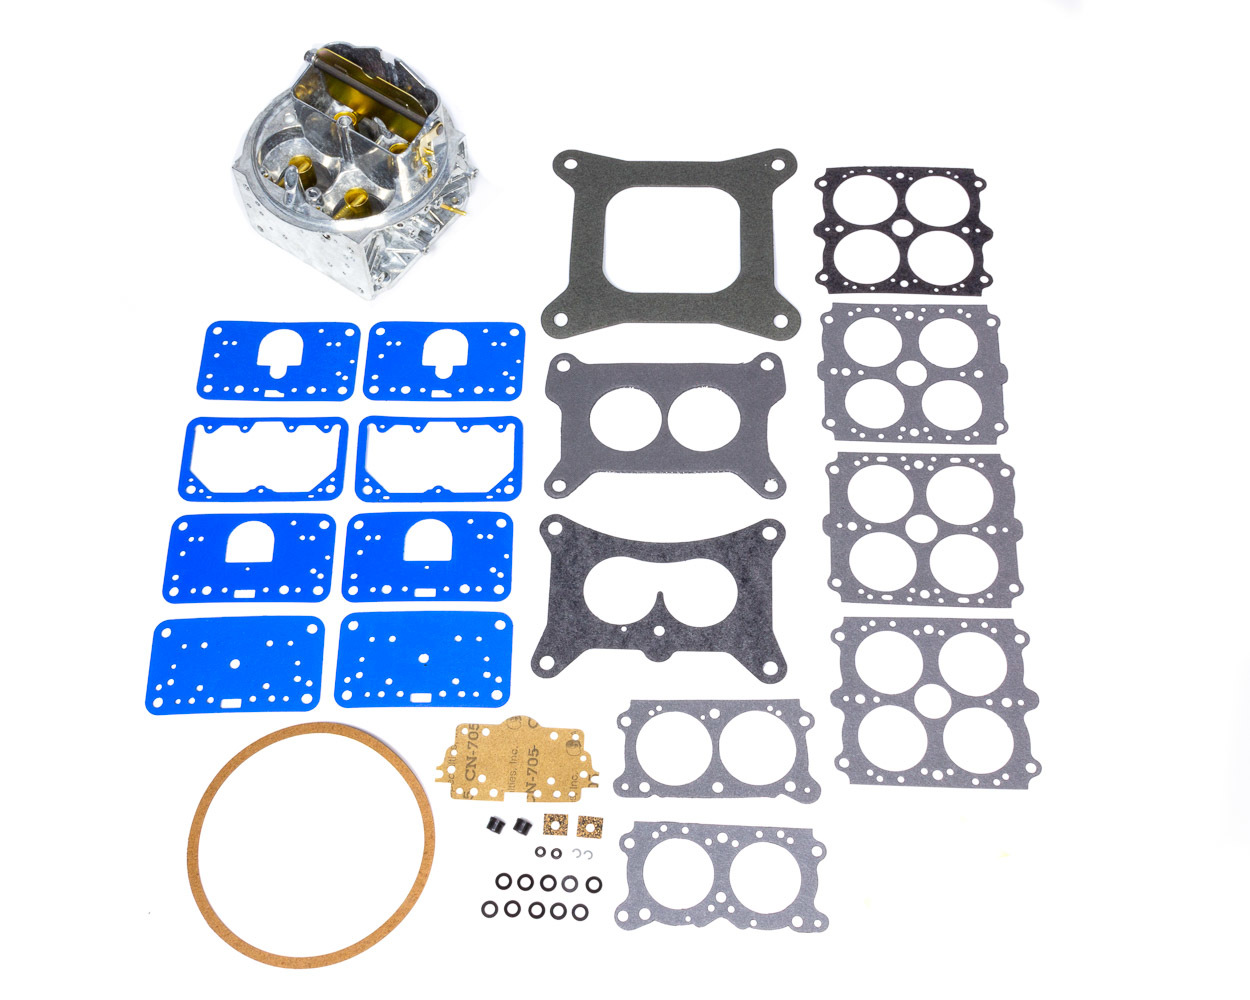 Holley 134-348 Carburetor Main Body, Replacement, 670 CFM, Zinc, Chromate, Holley Street Avenger Model 4150 Carburetor, Kit